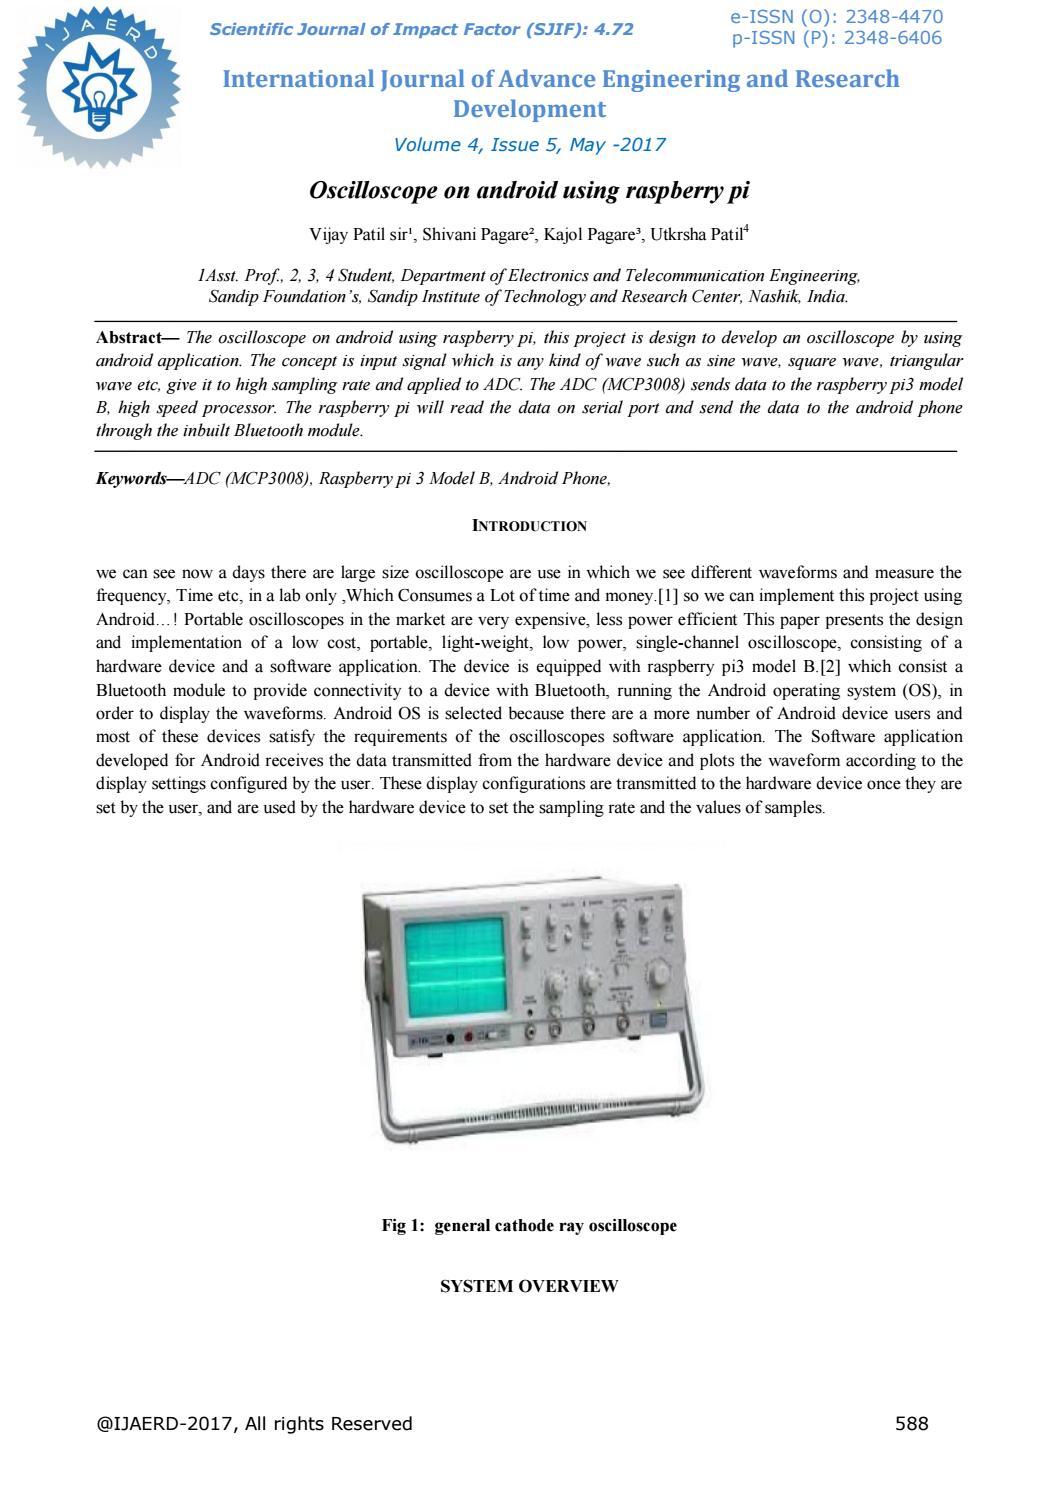 Oscilloscope on android using raspberry pi ijaerdv04i0521841